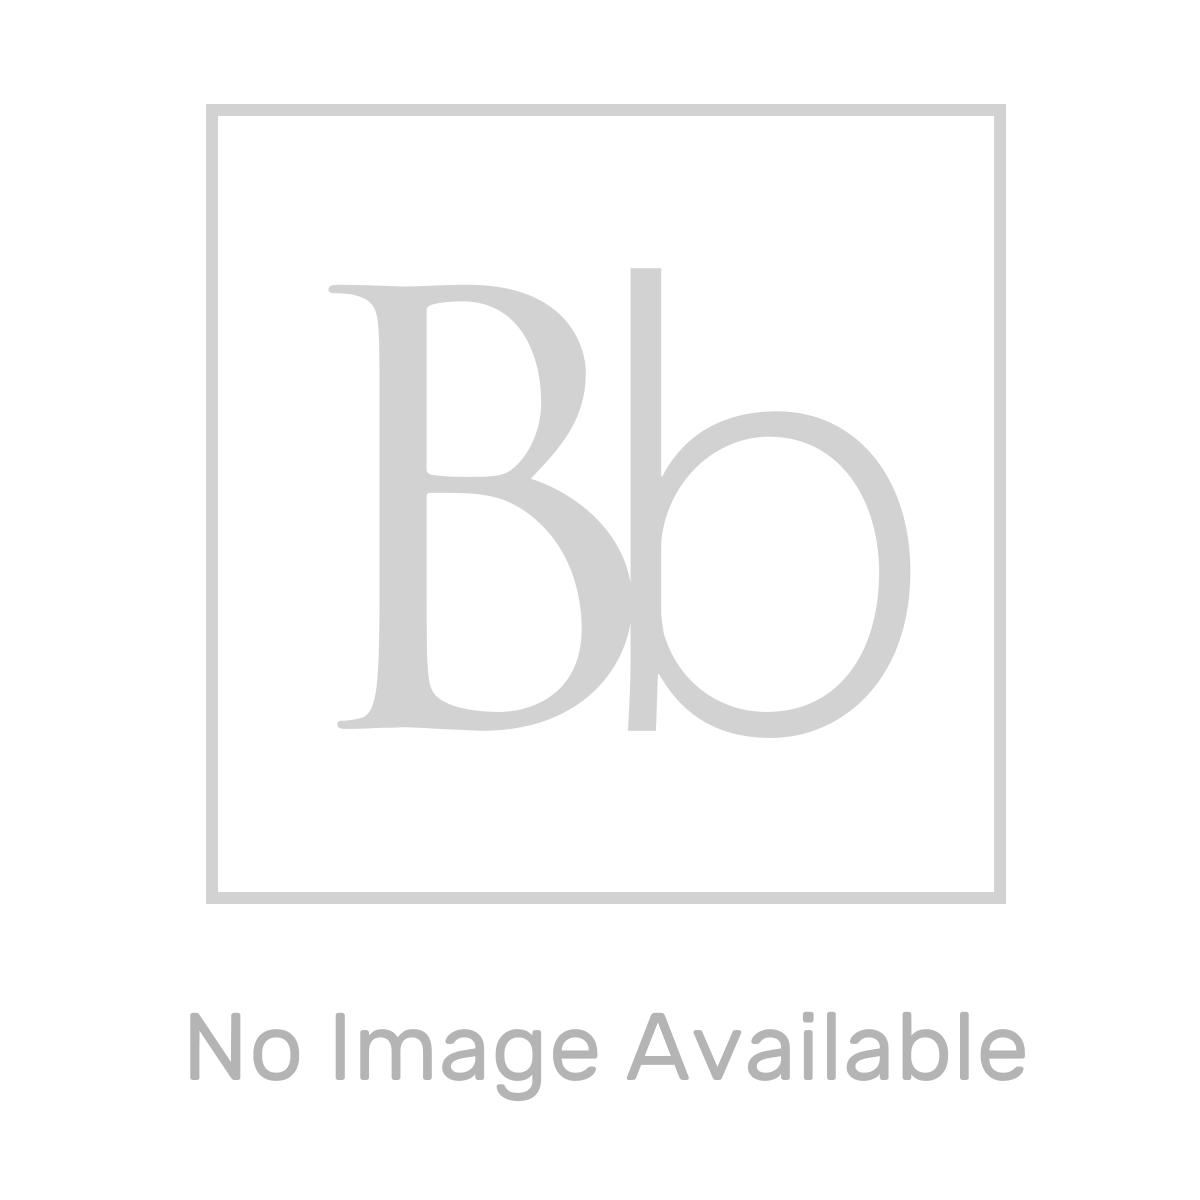 RAK Ecofix Matt Chrome Flush Plate with Round Push Buttons Measurements